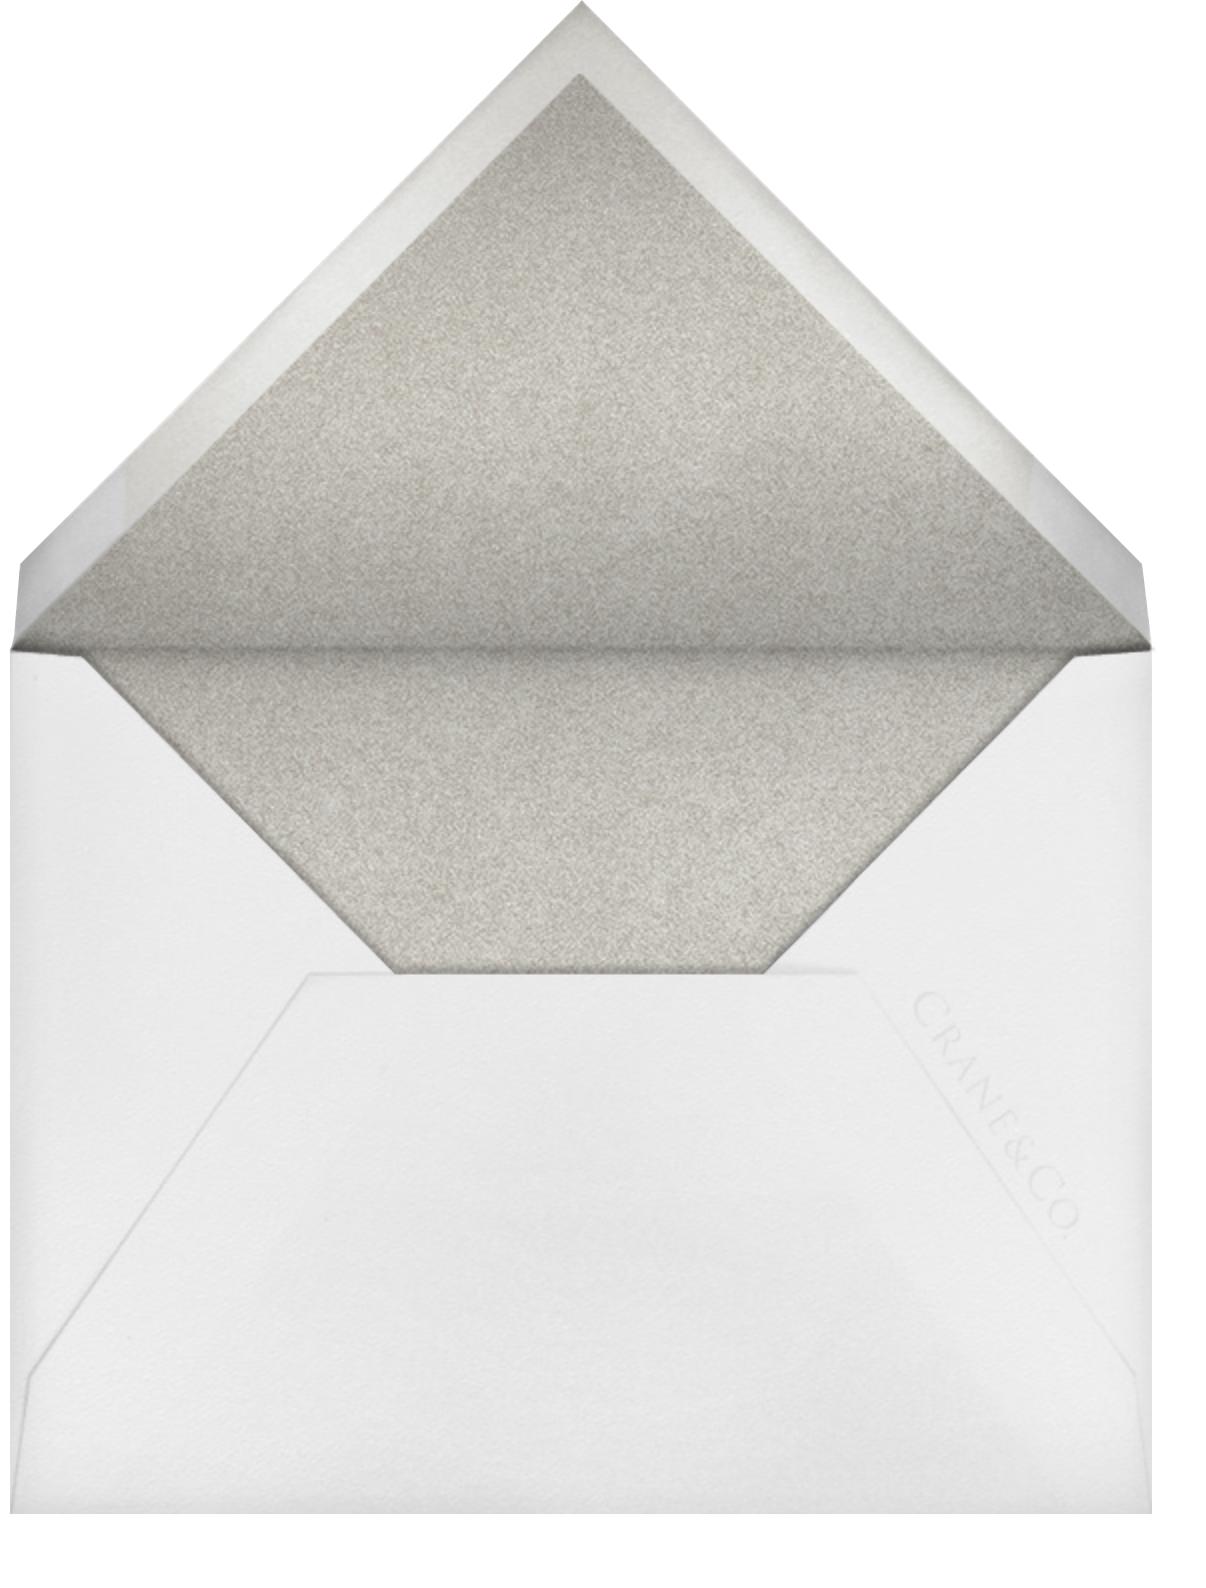 Blossoms on Tulle II - Peony - Oscar de la Renta - All - envelope back